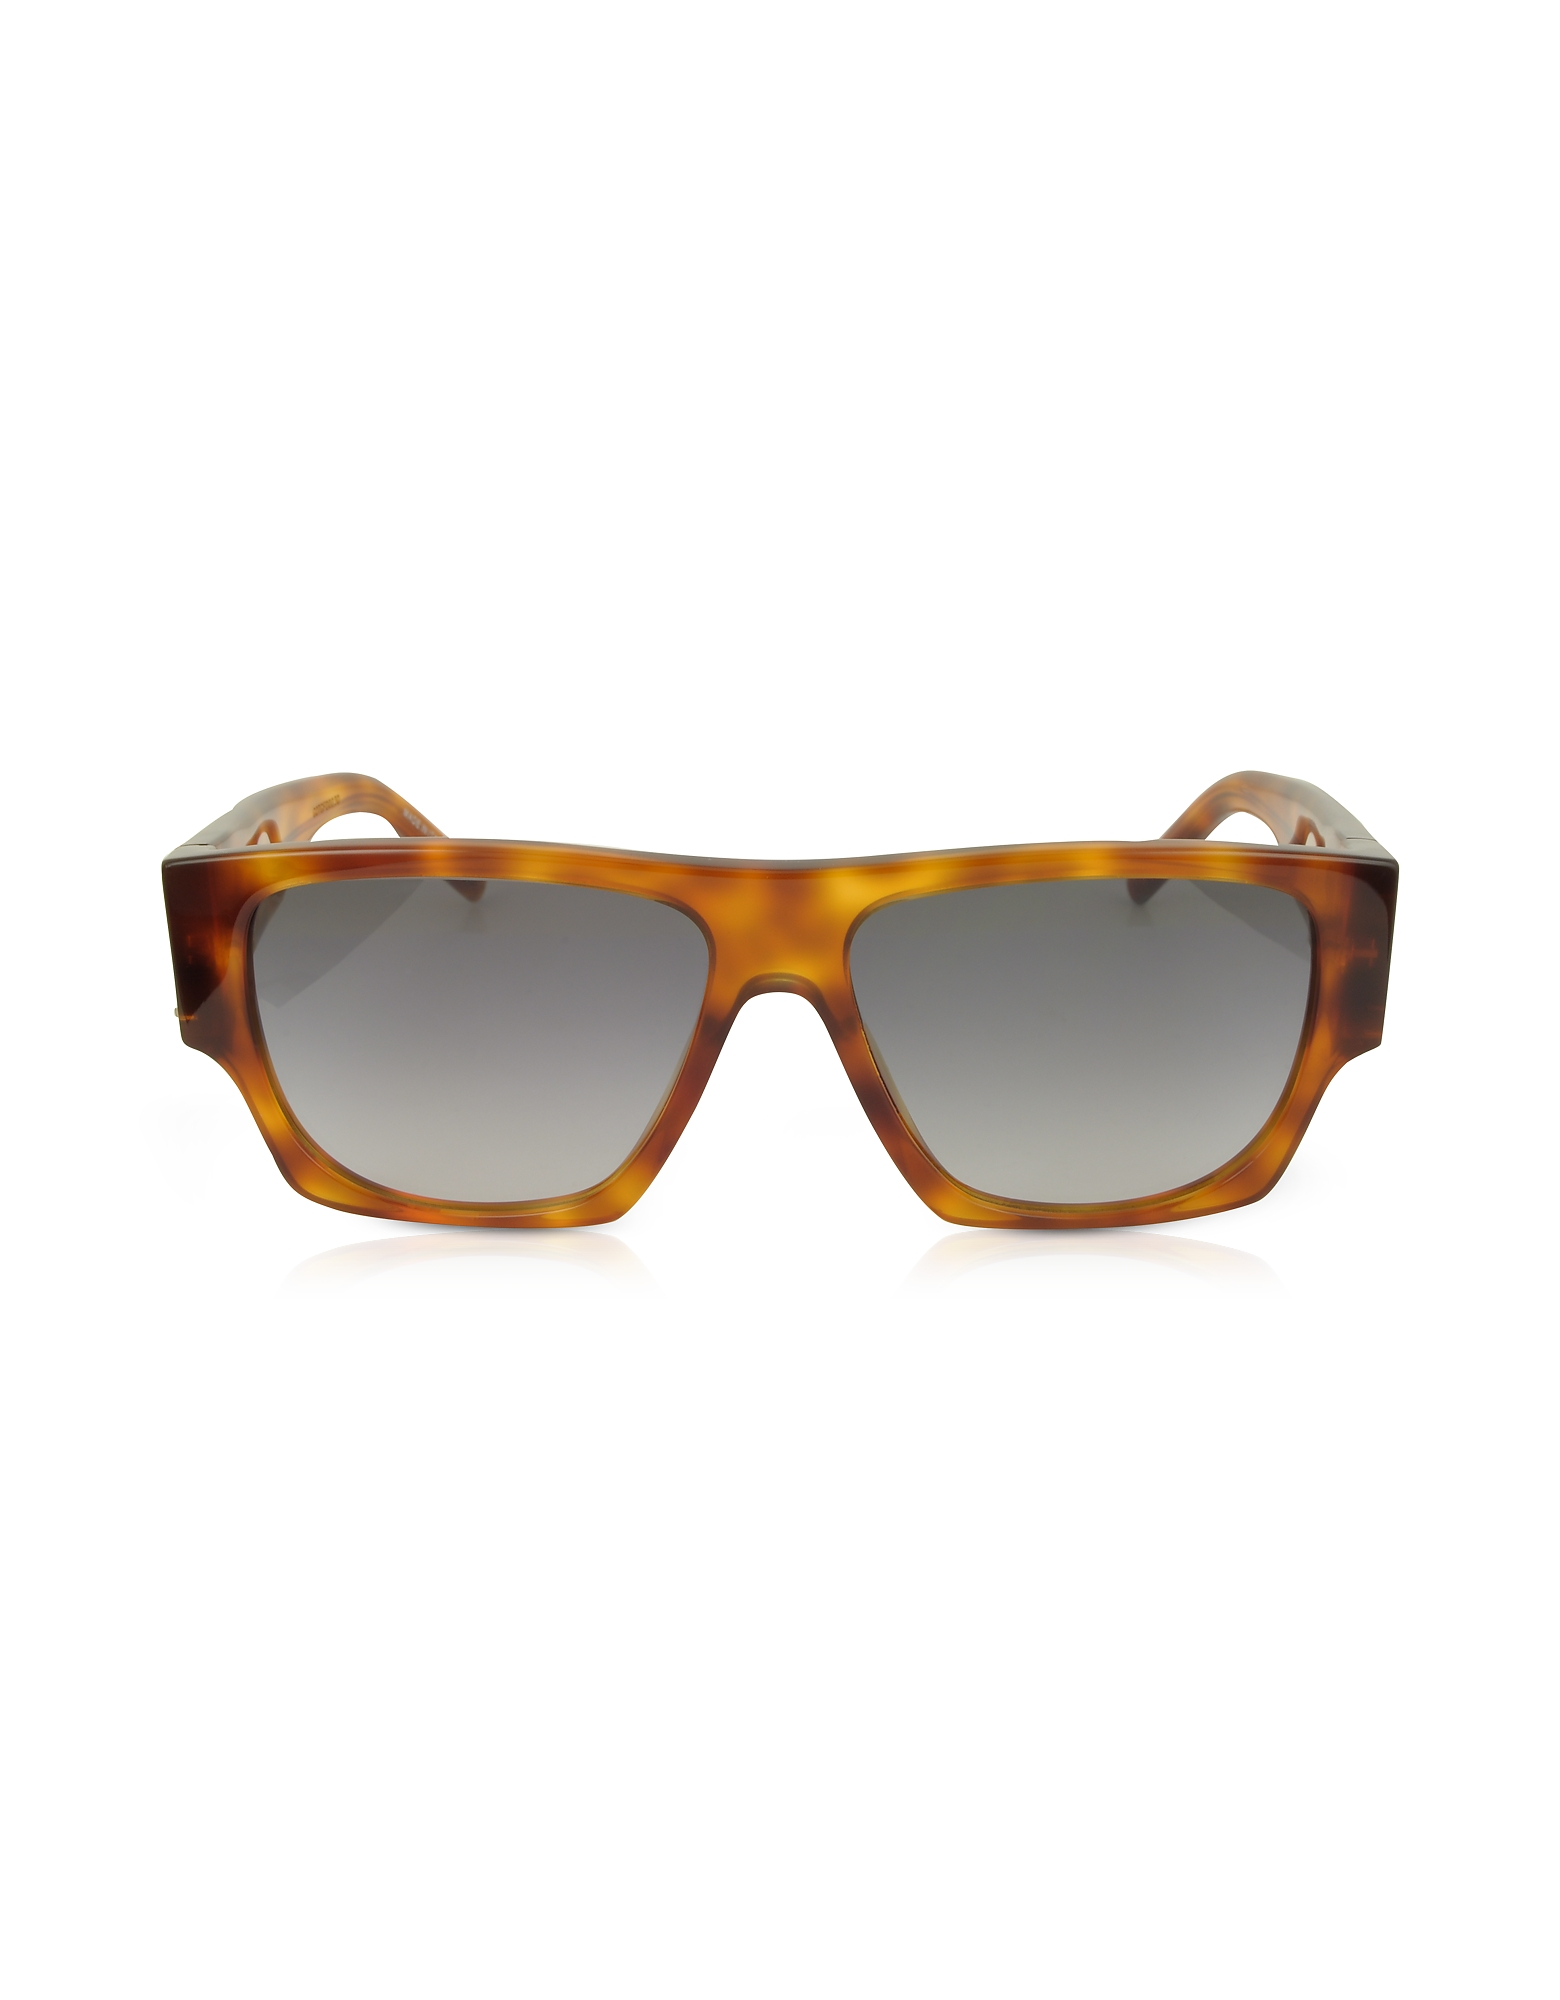 Saint Laurent Sunglasses, SL M17 Rectangle Frame Acetate Men's Sunglasses